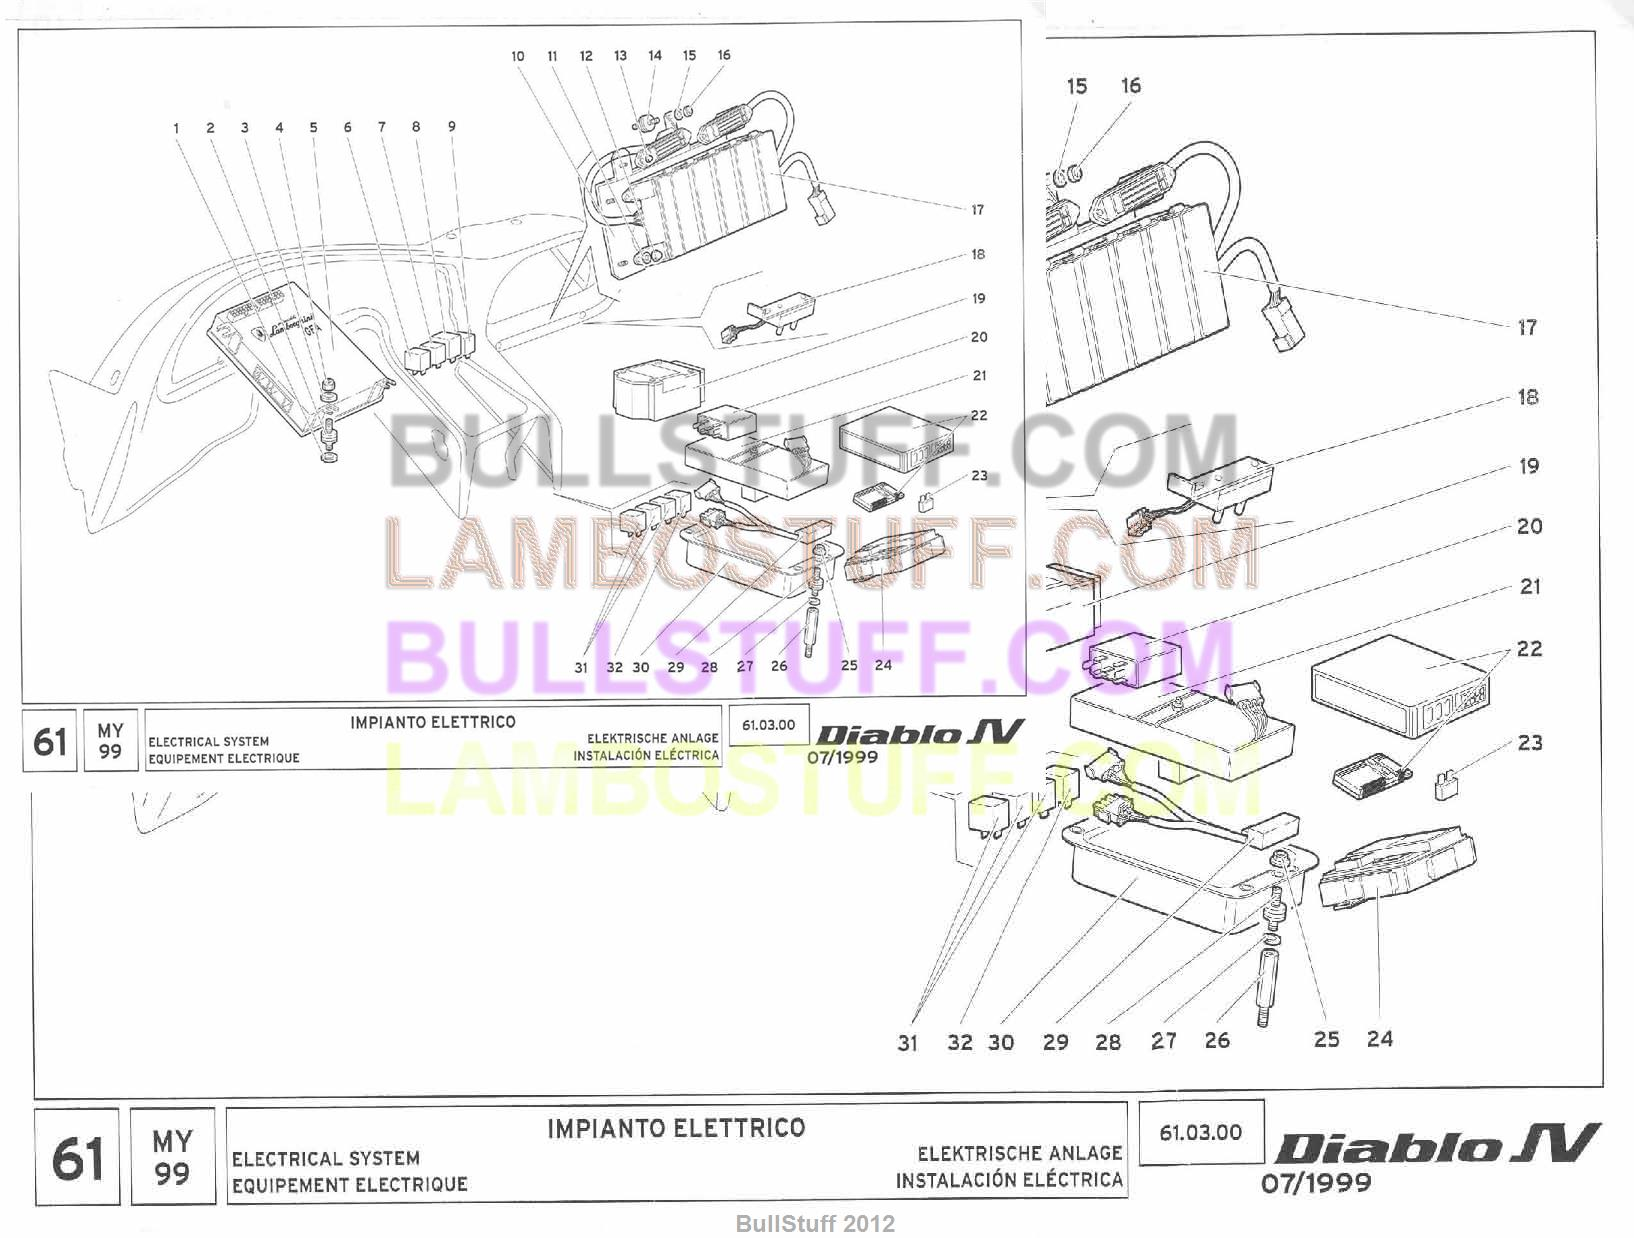 1999 lamborghini diablo sv usa electrical system 61 03 00 rh bullstuff com